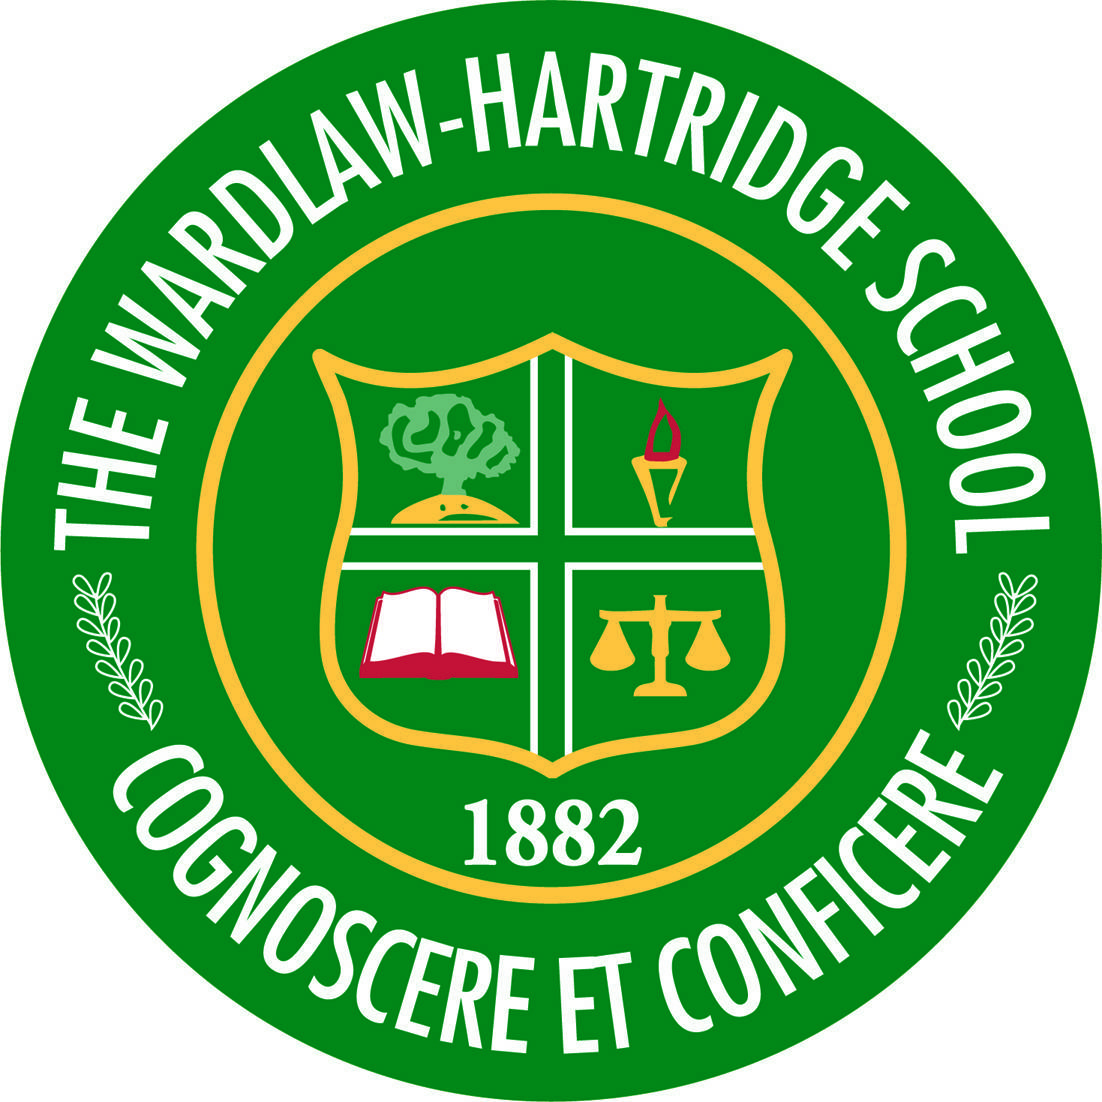 13d98e49b166b51c38a3_Wardlaw_Hartridge_logo.jpg